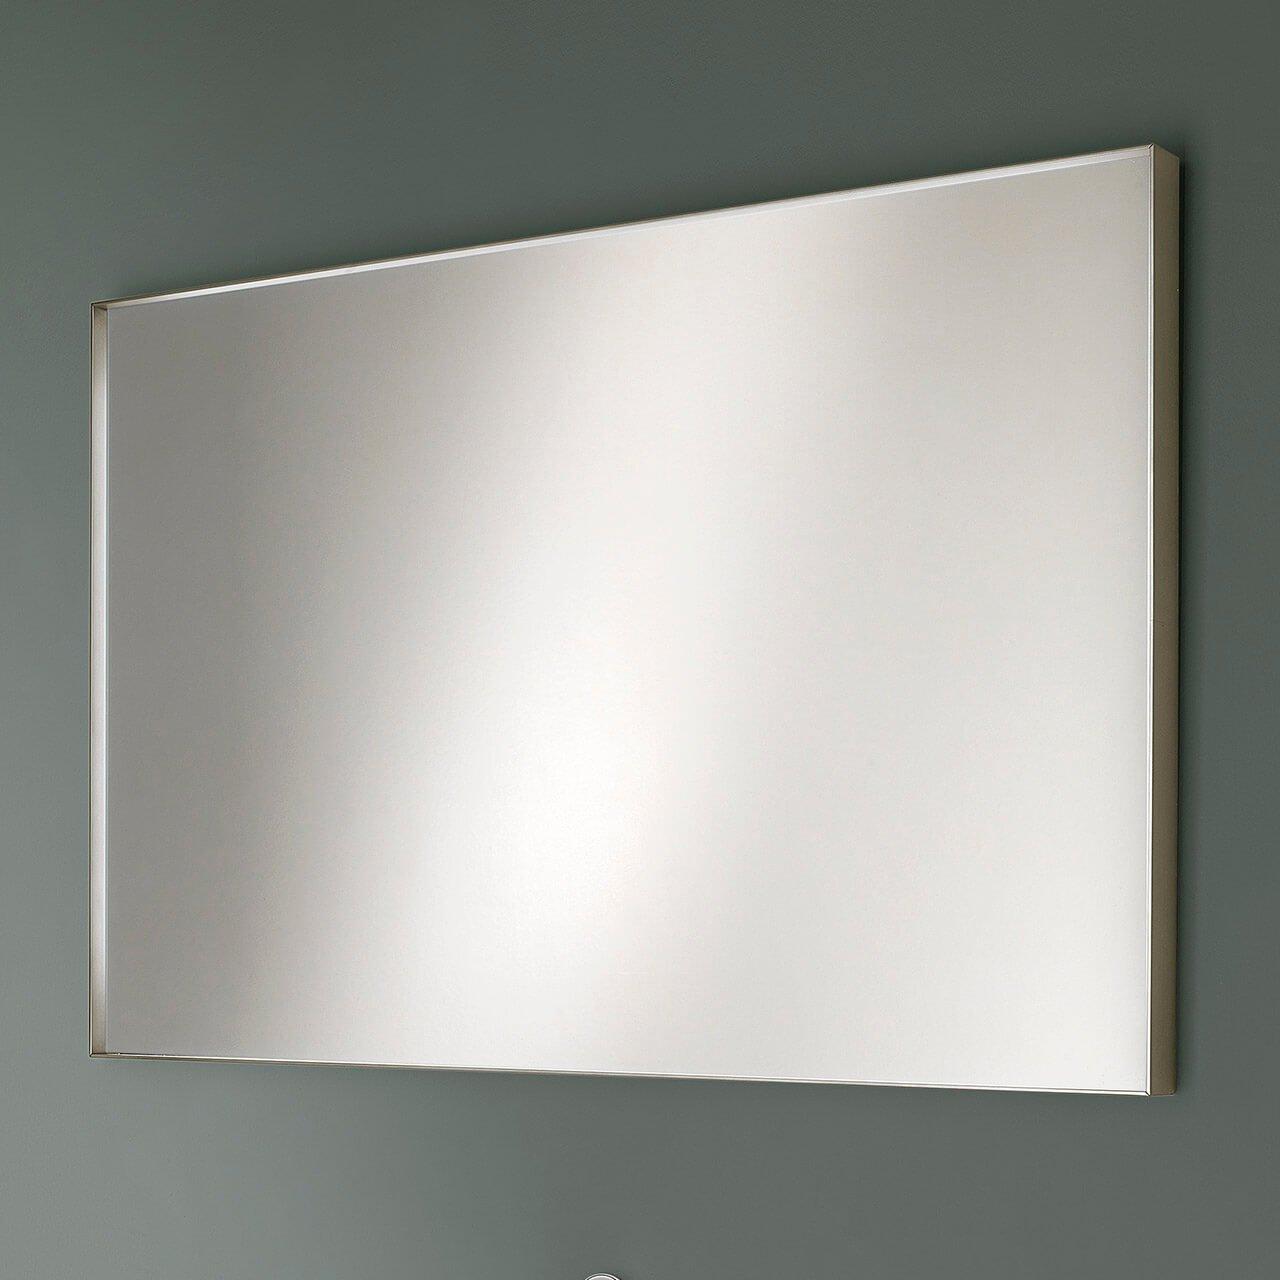 specchio CharmeS platino